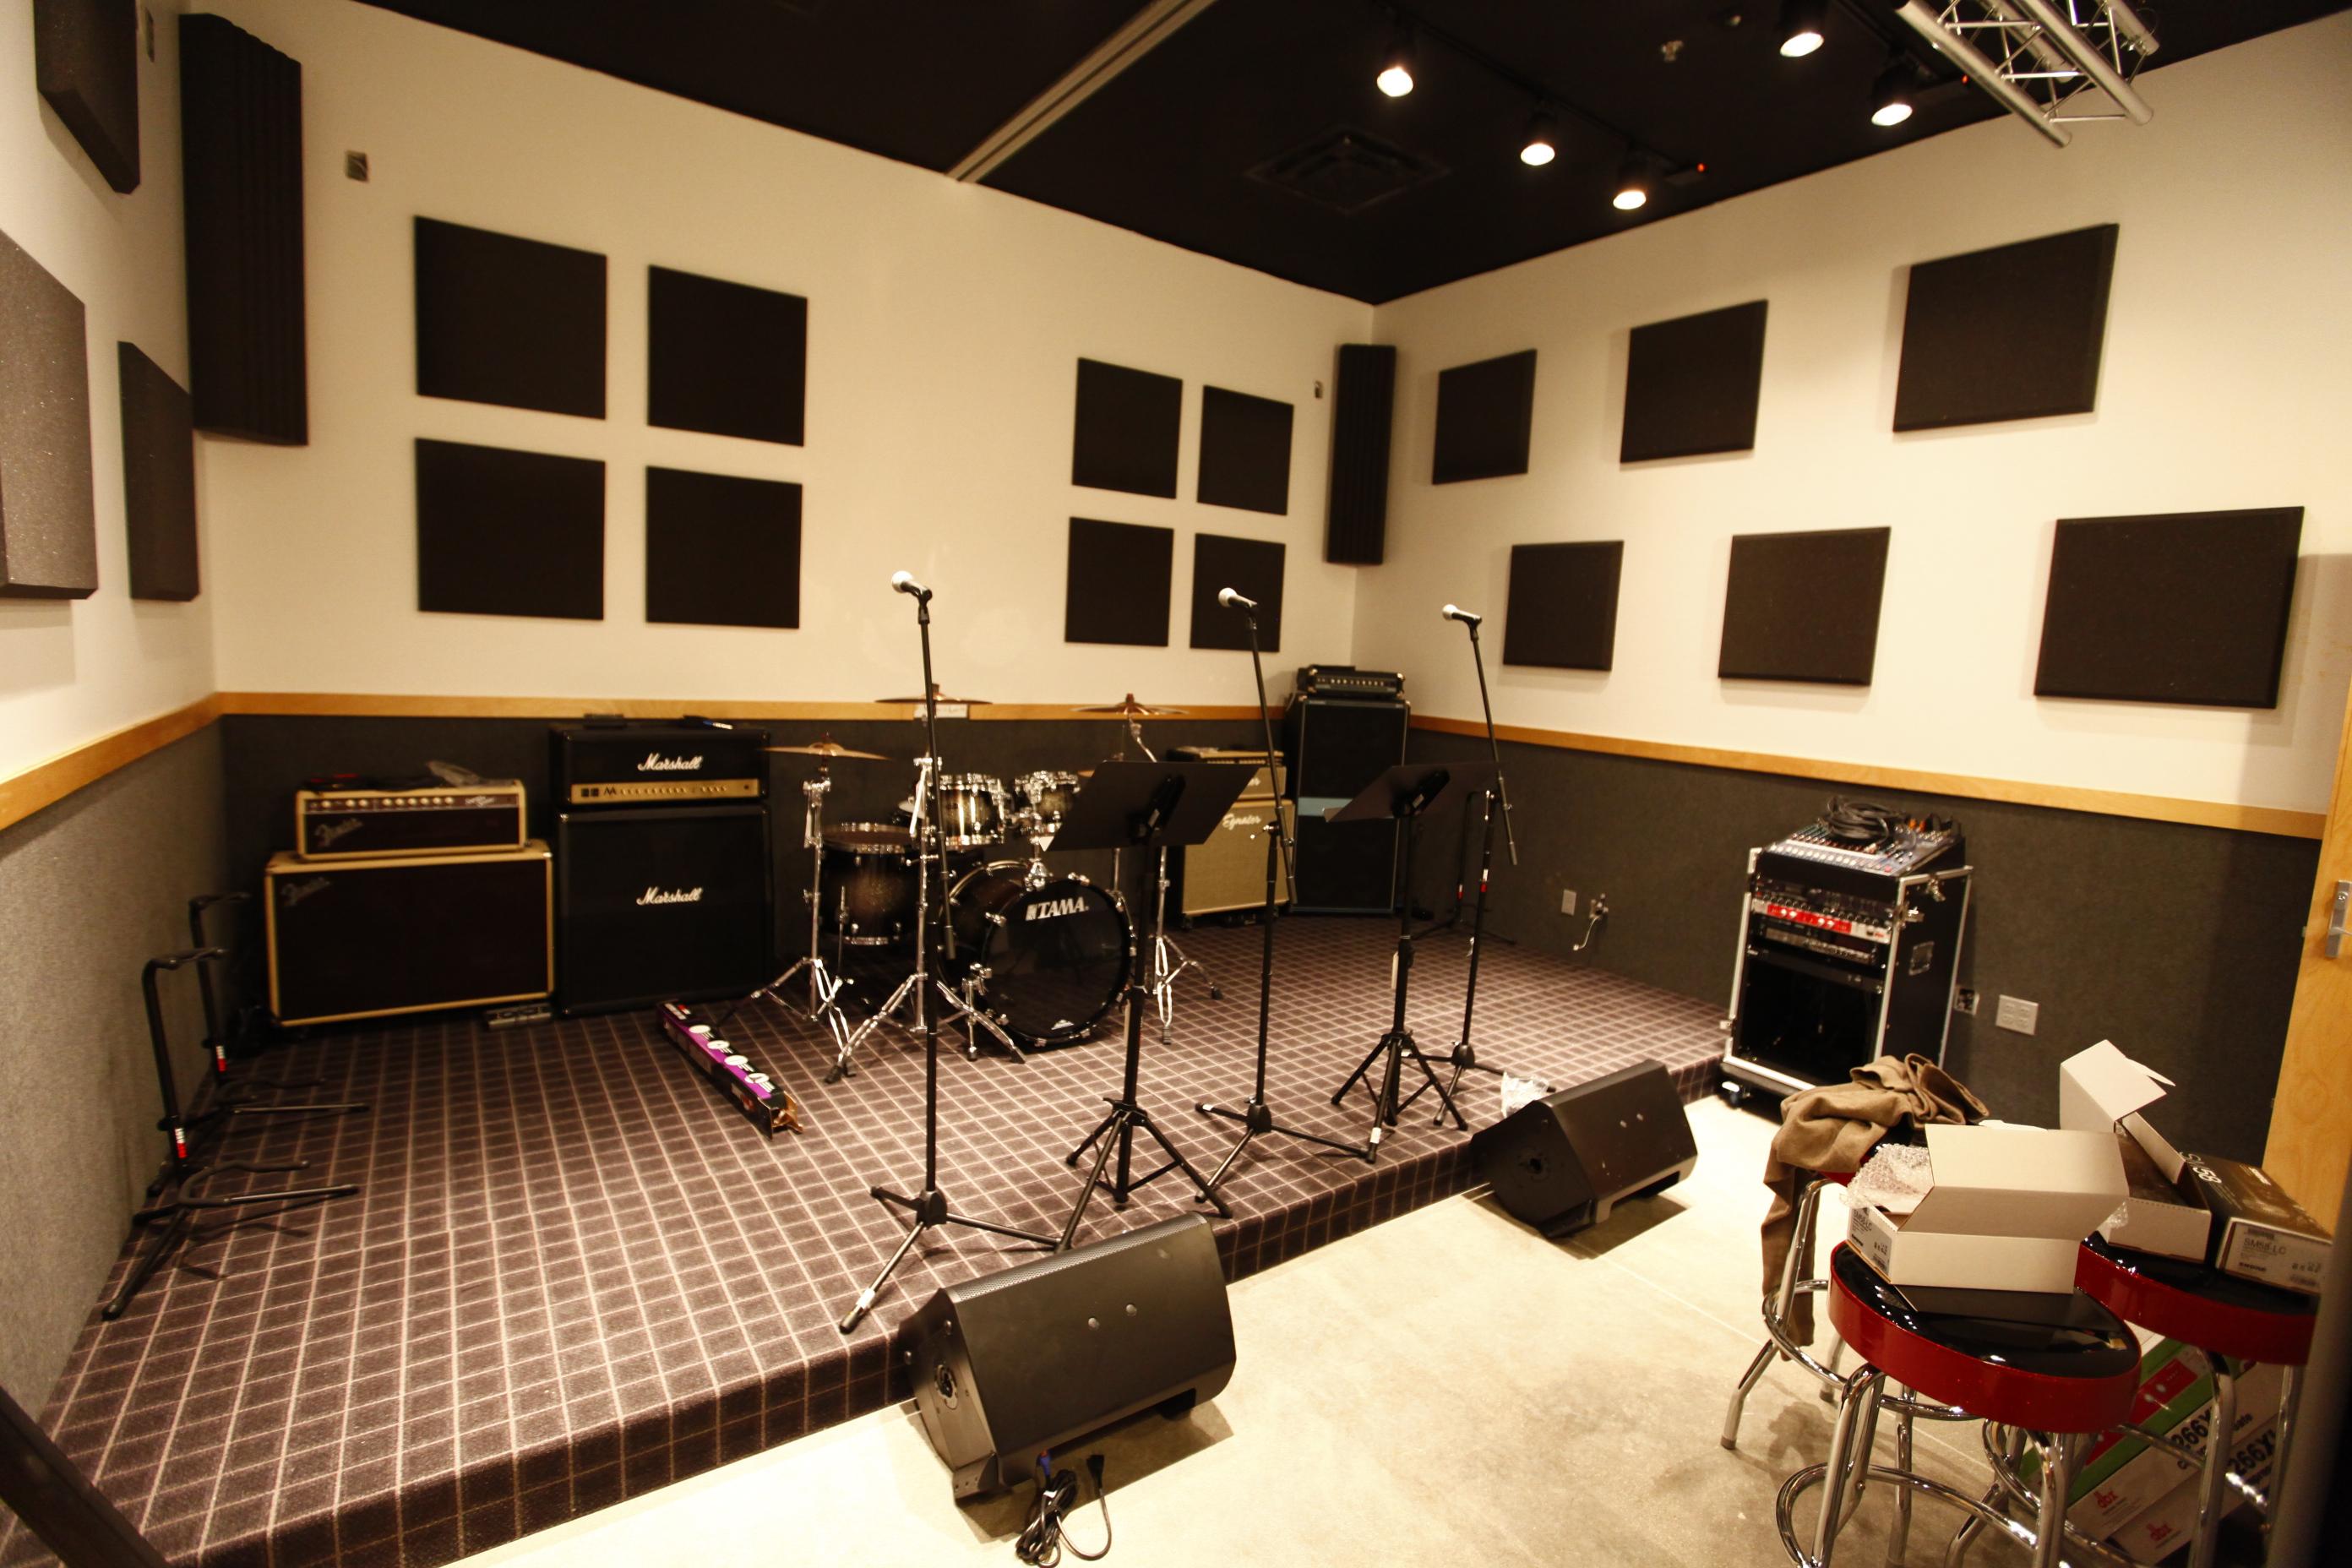 guitar center lessons louisville kentucky ky. Black Bedroom Furniture Sets. Home Design Ideas